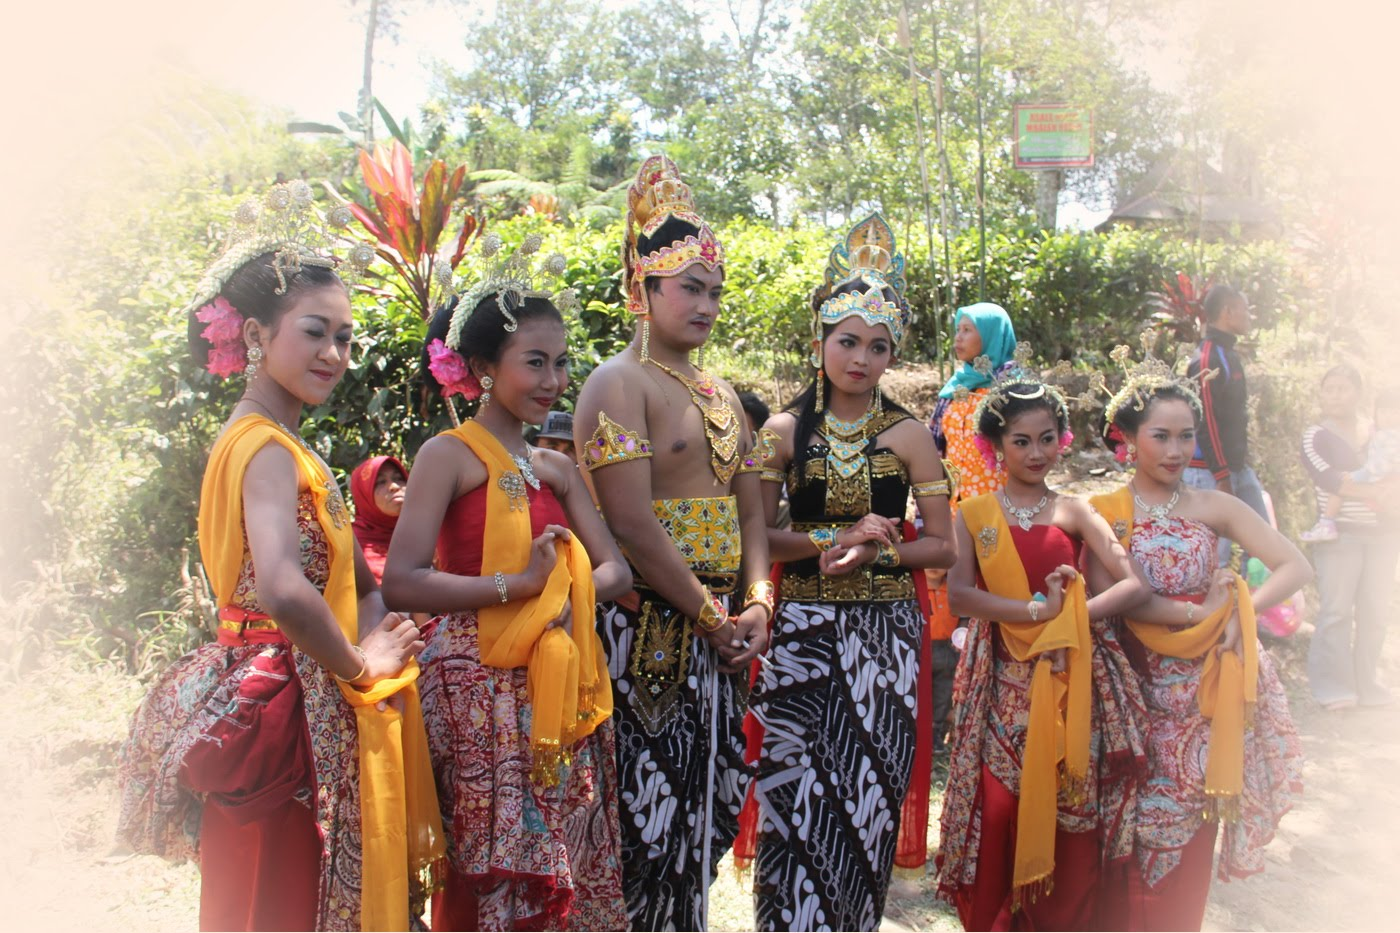 Traditional Dance Tari Gambyong Youtube Candi Penampihan Kab Tulungagung